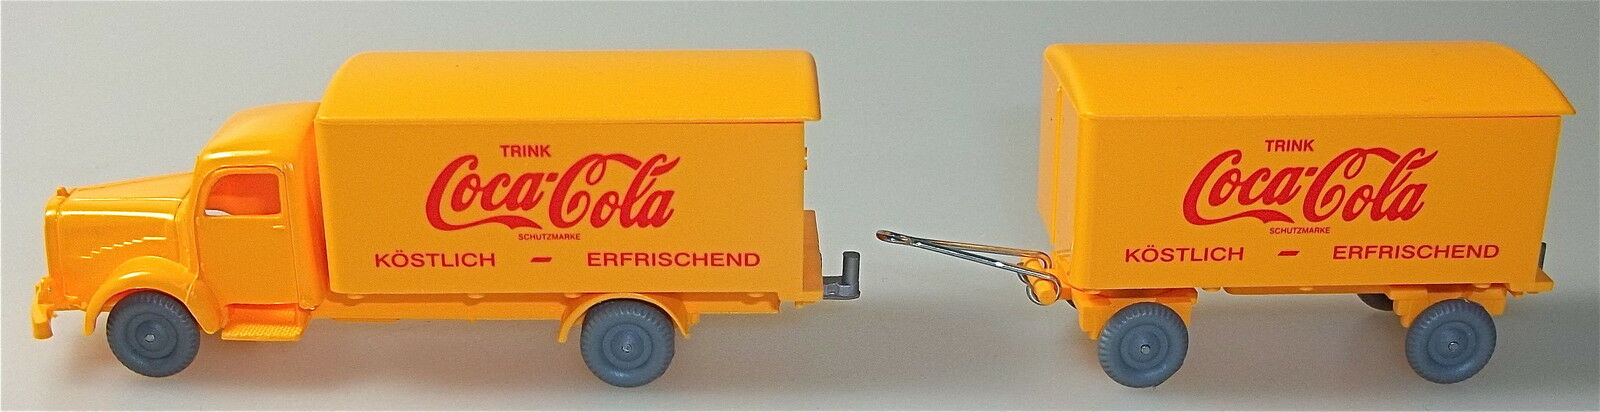 Coca Cola Mercedes 5000 Roadtrain orange Imu H0 1 87  56   Å